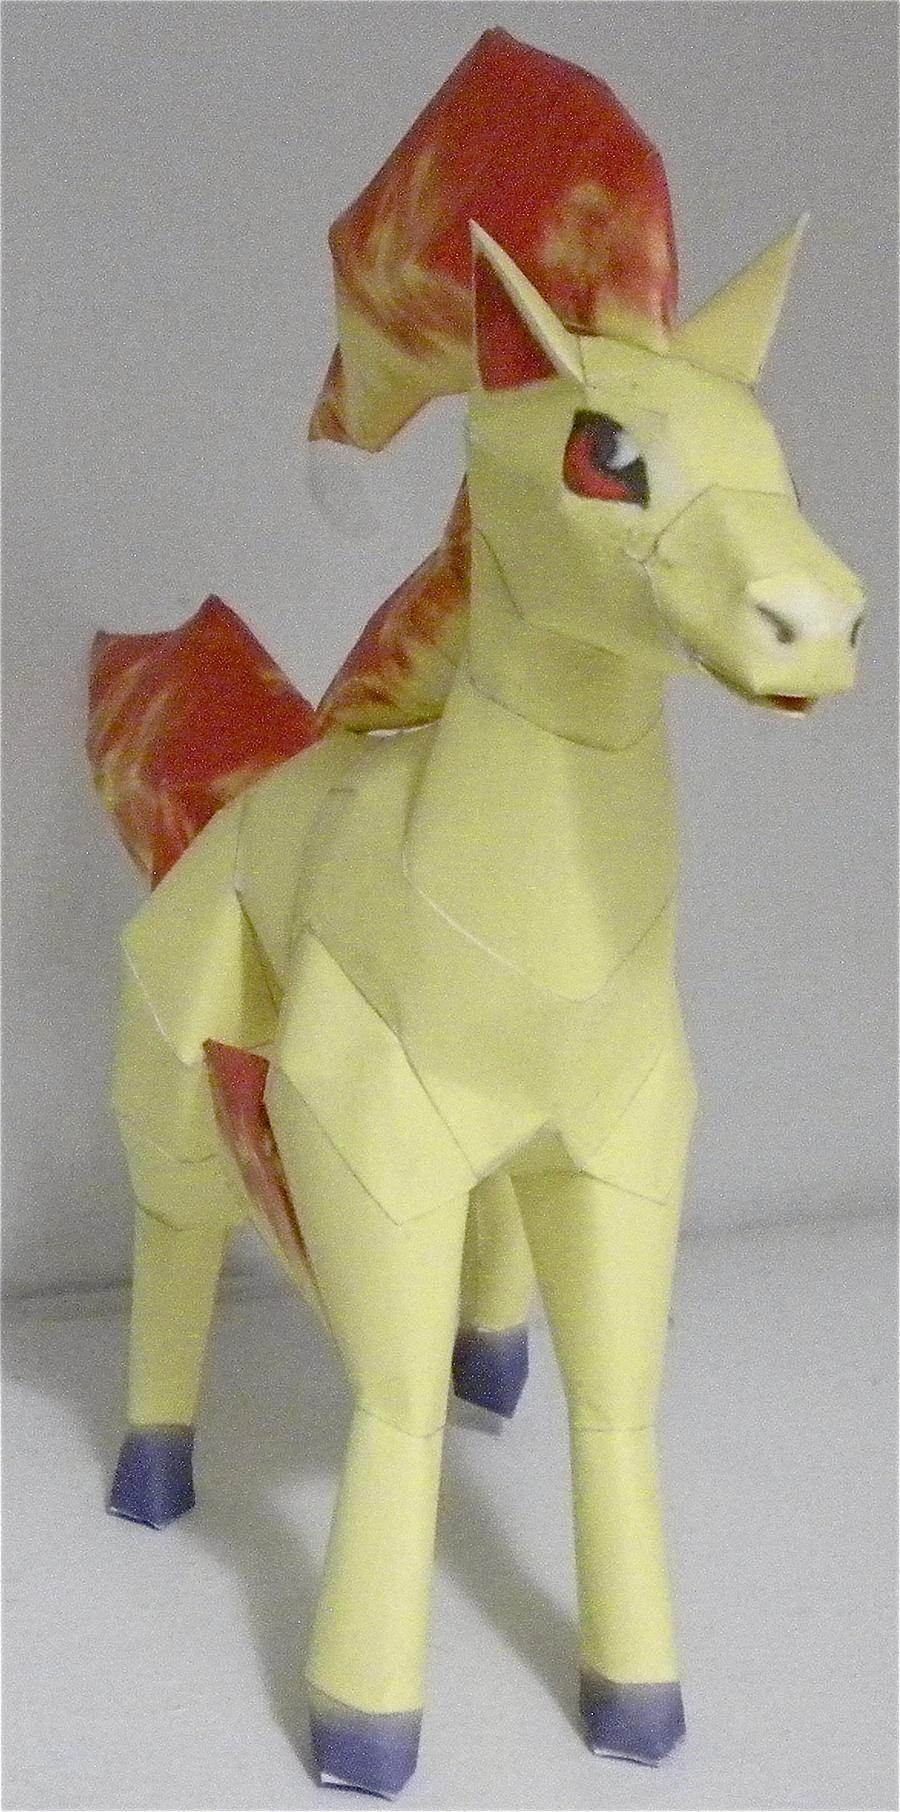 Ponyta by jewzeepapercraft